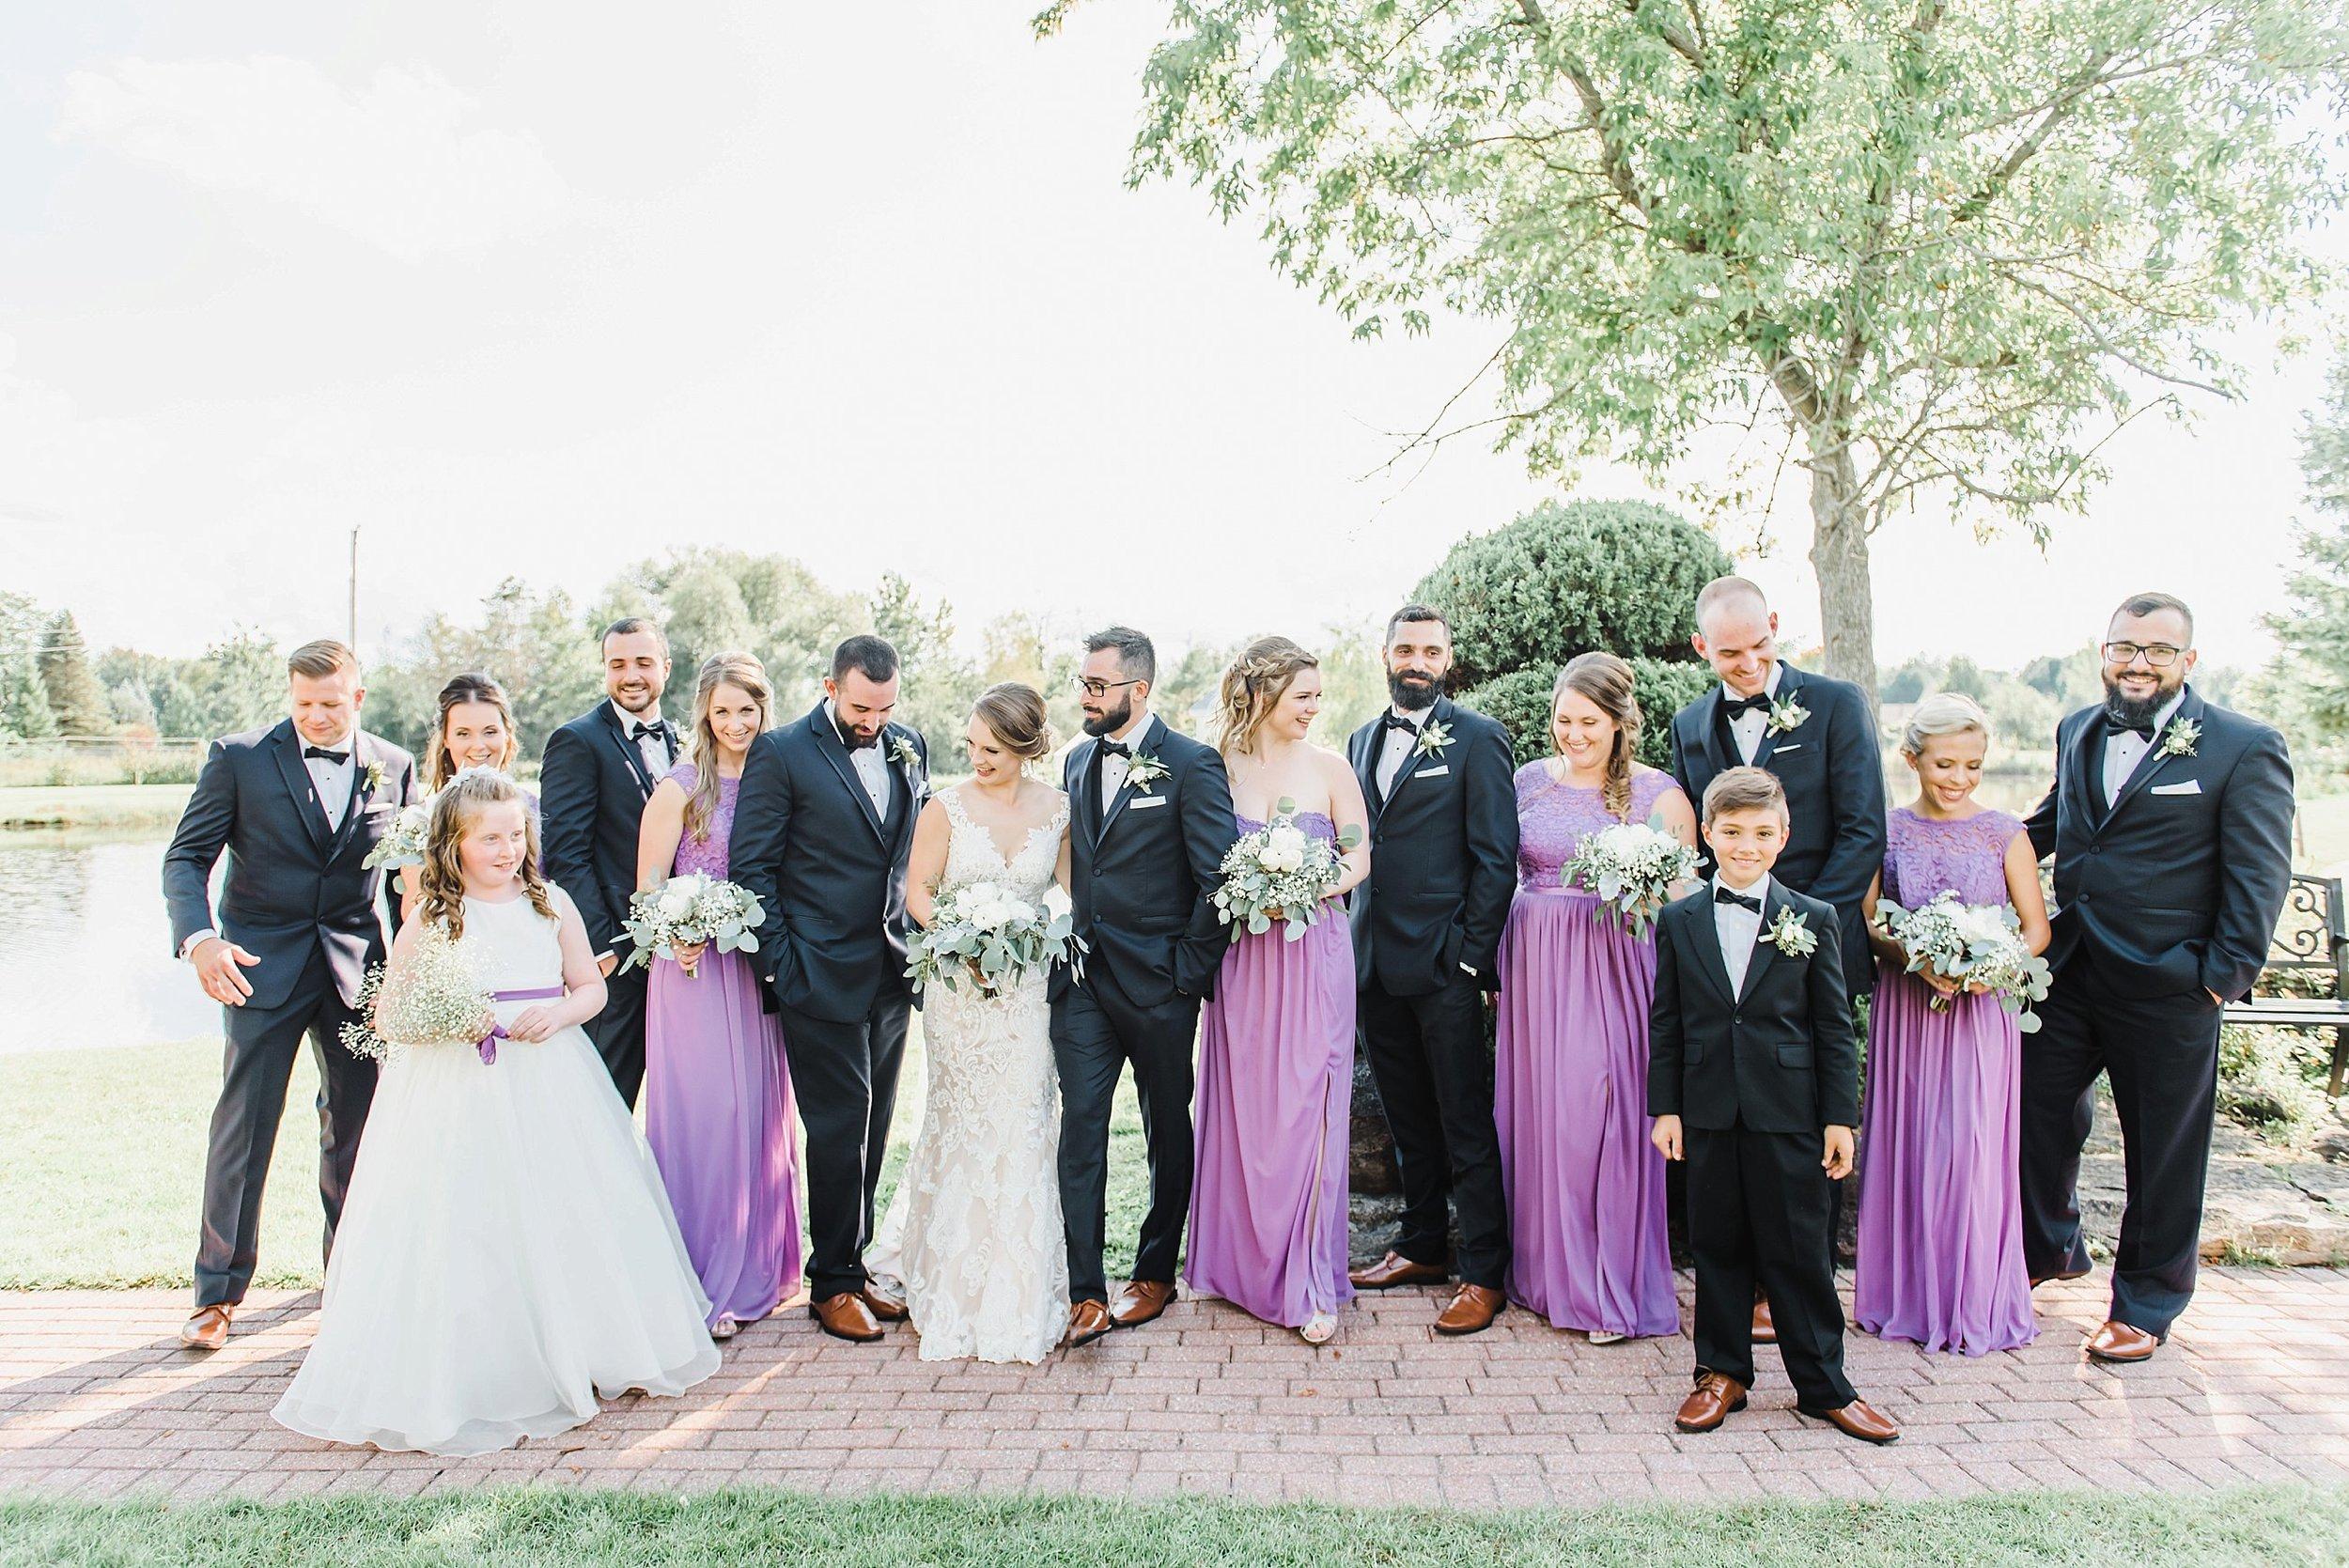 light airy indie fine art ottawa wedding photographer | Ali and Batoul Photography_1284.jpg